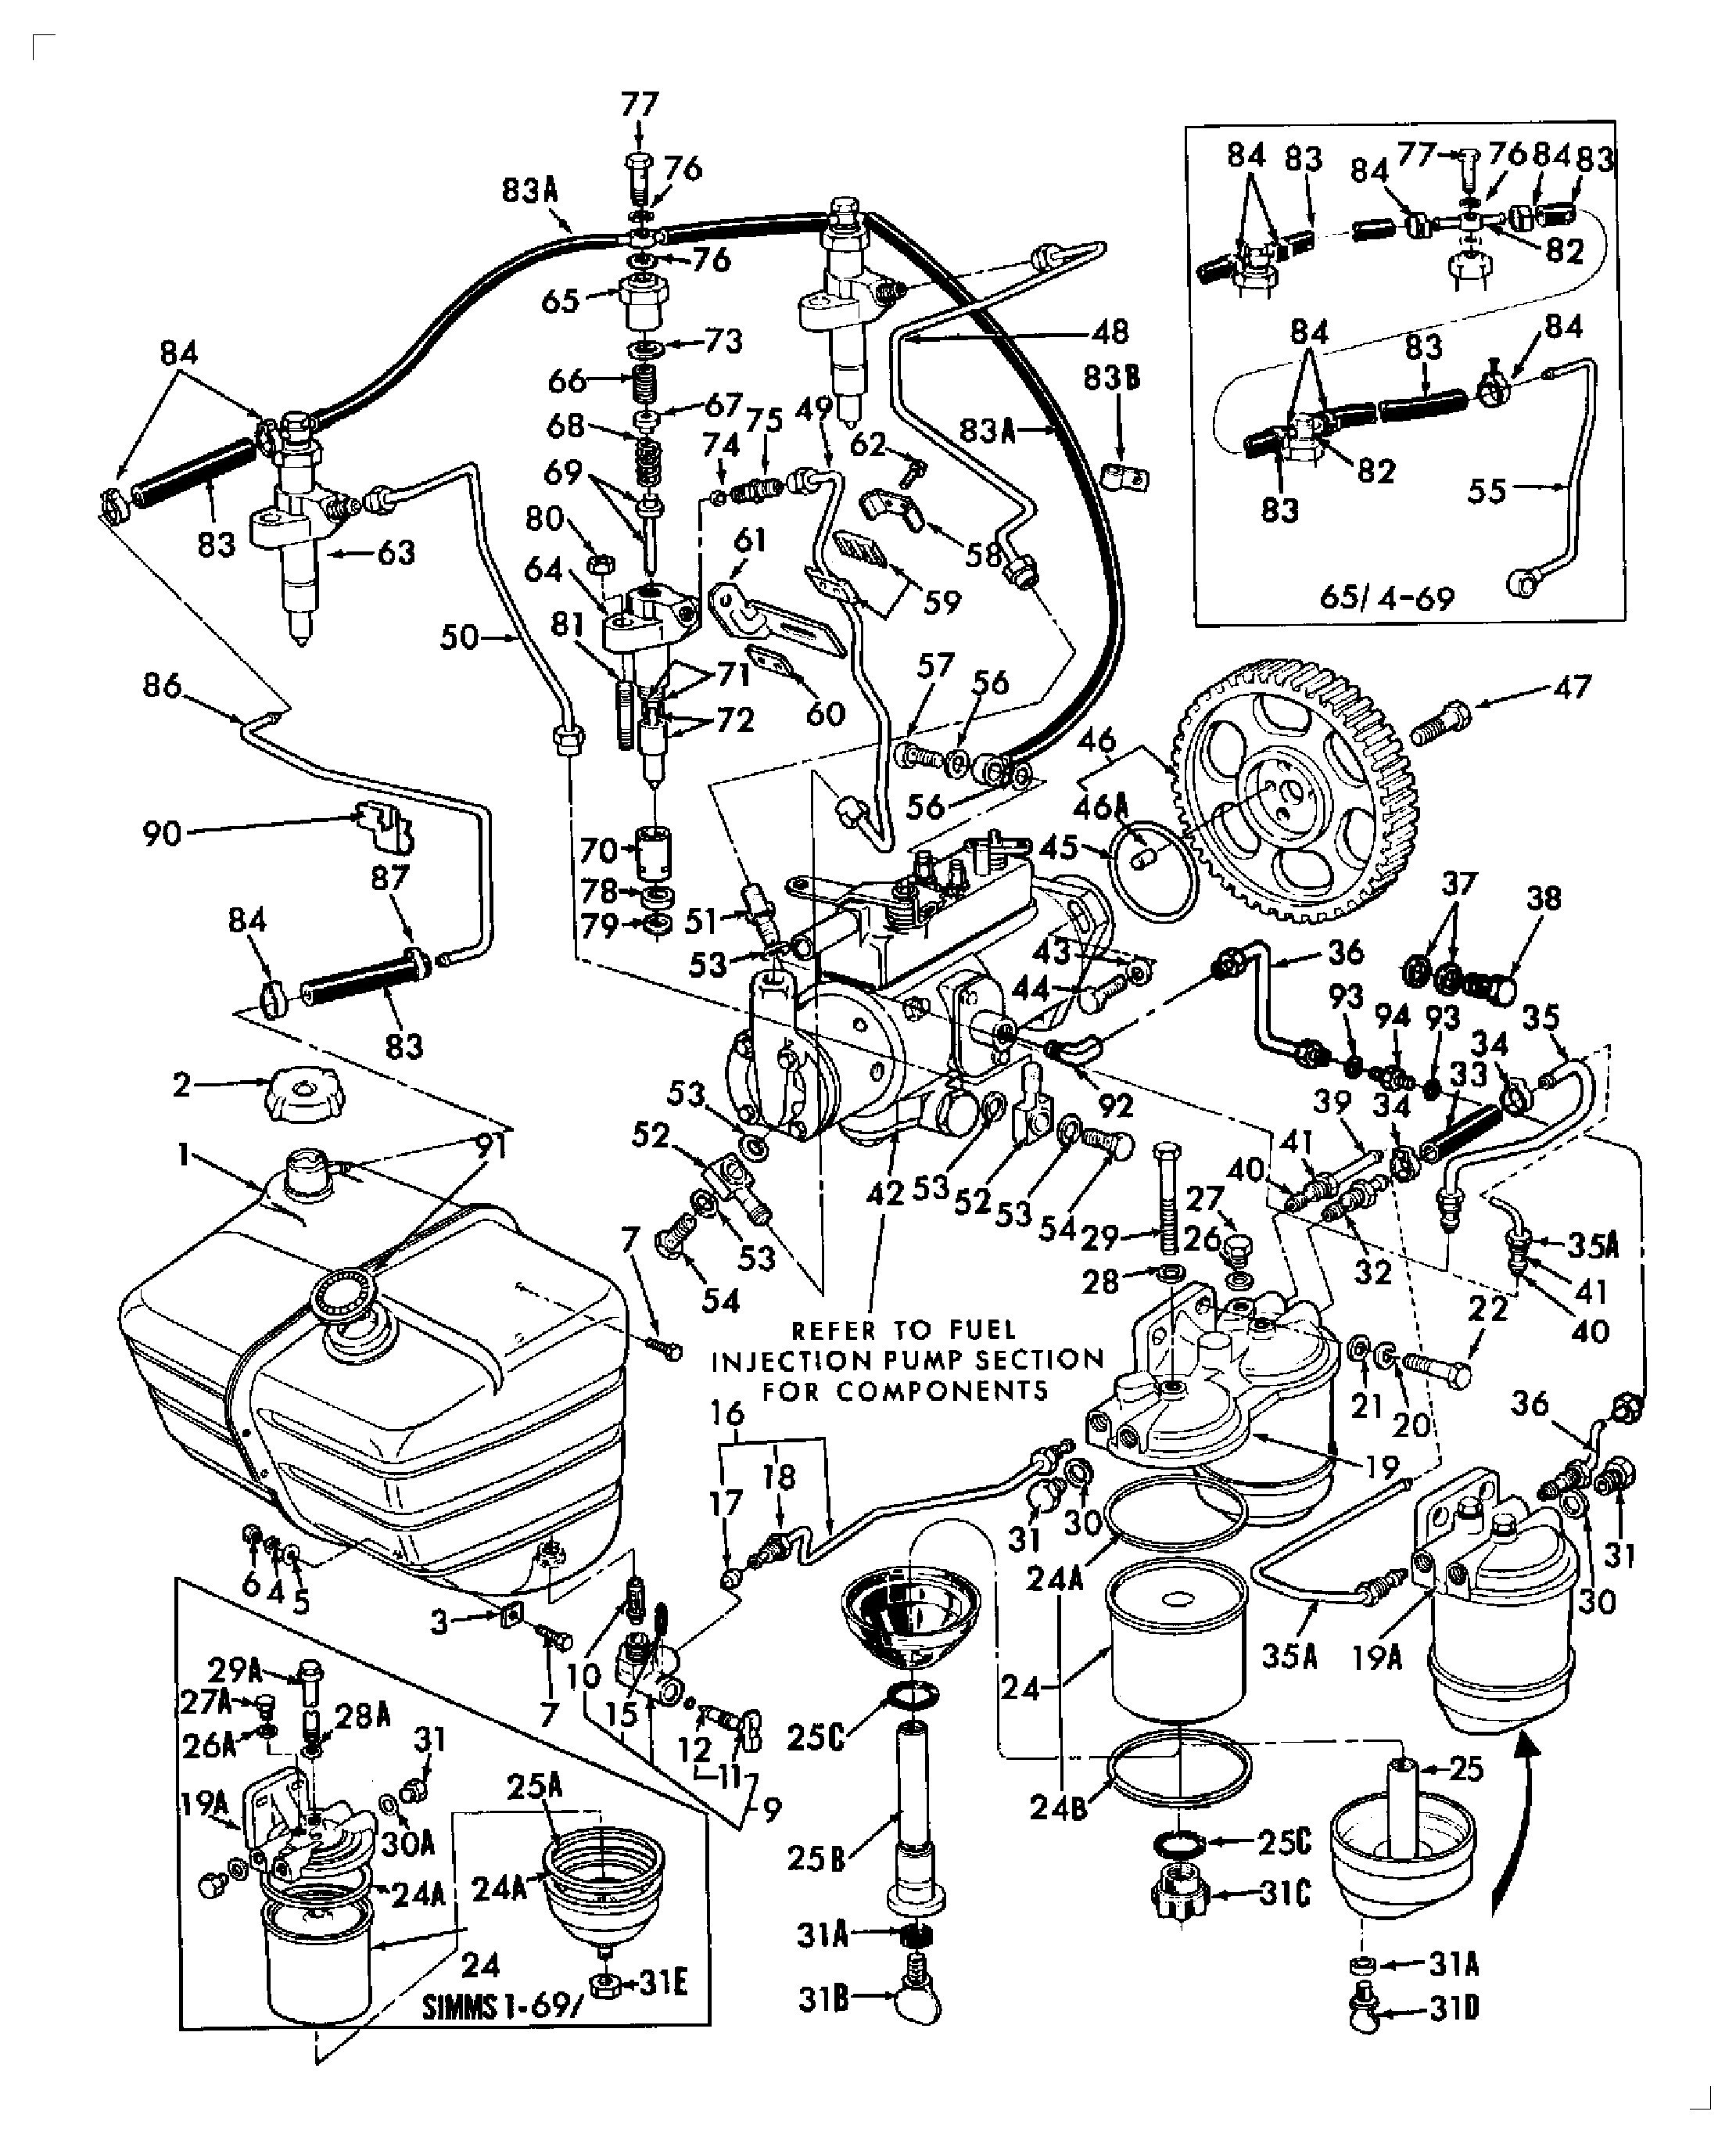 40 hp evinrude parts diagram